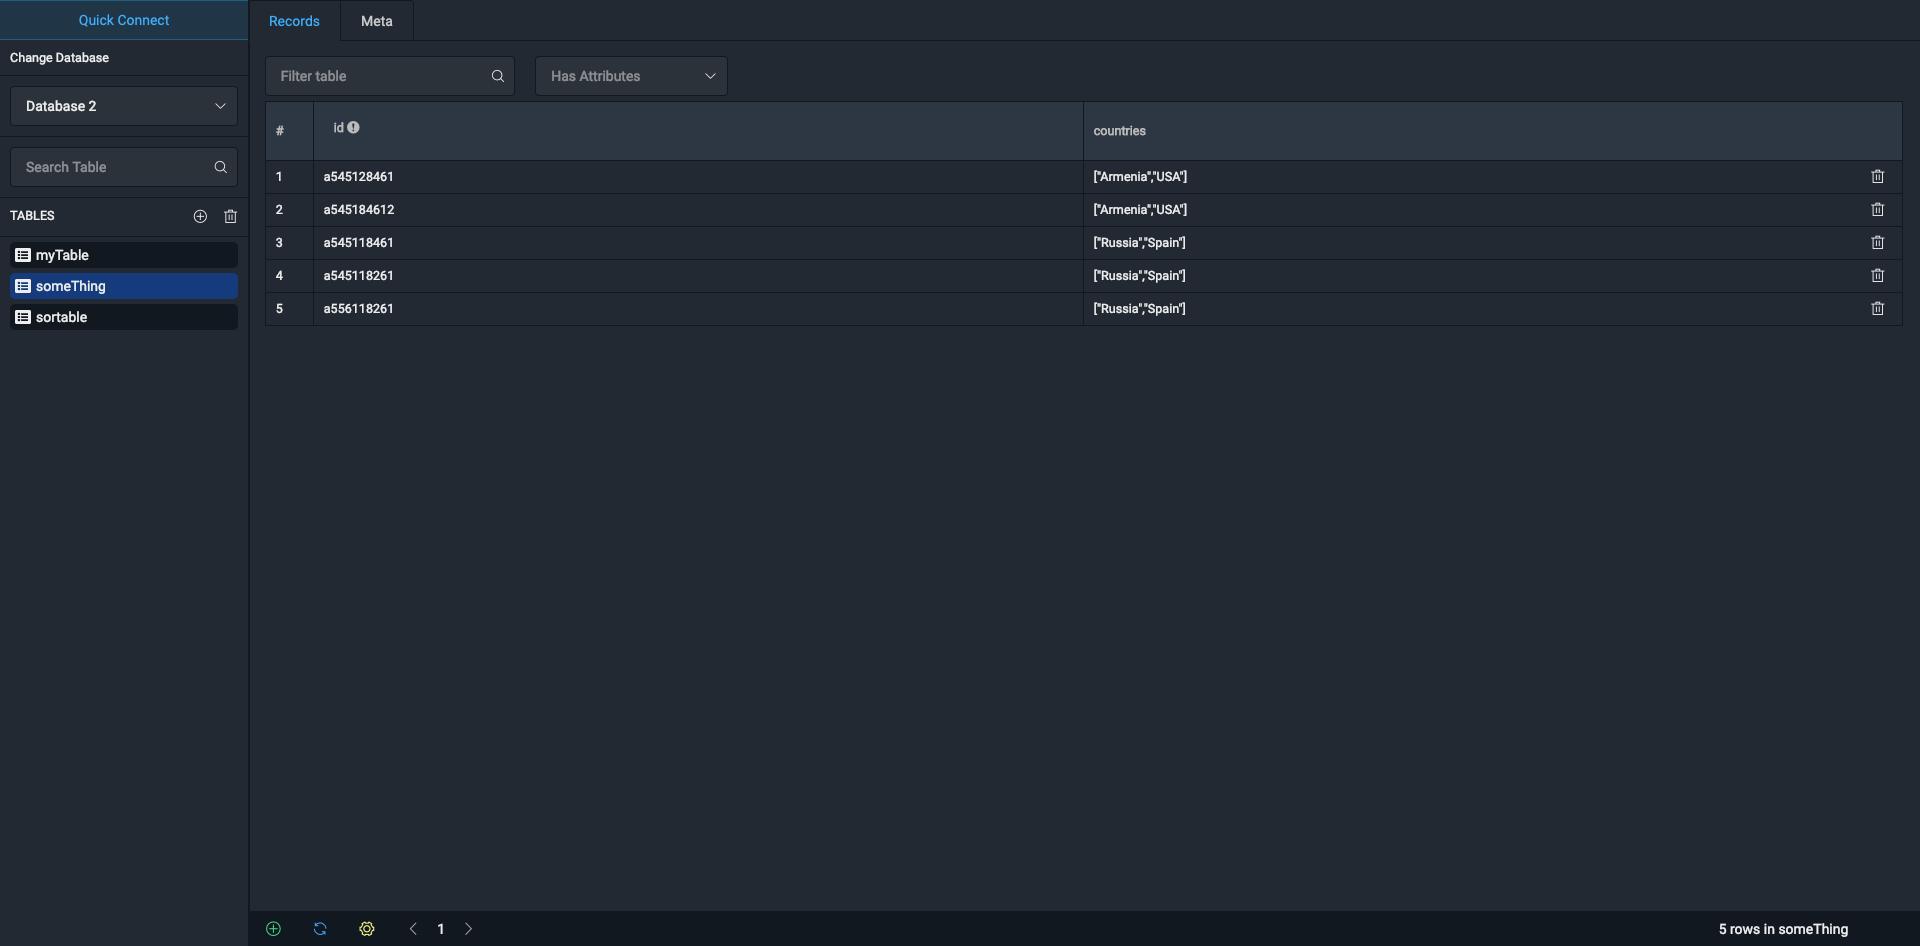 GitHub - Arattian/DynamoDb-GUI-Client: DynamoDb GUI Client